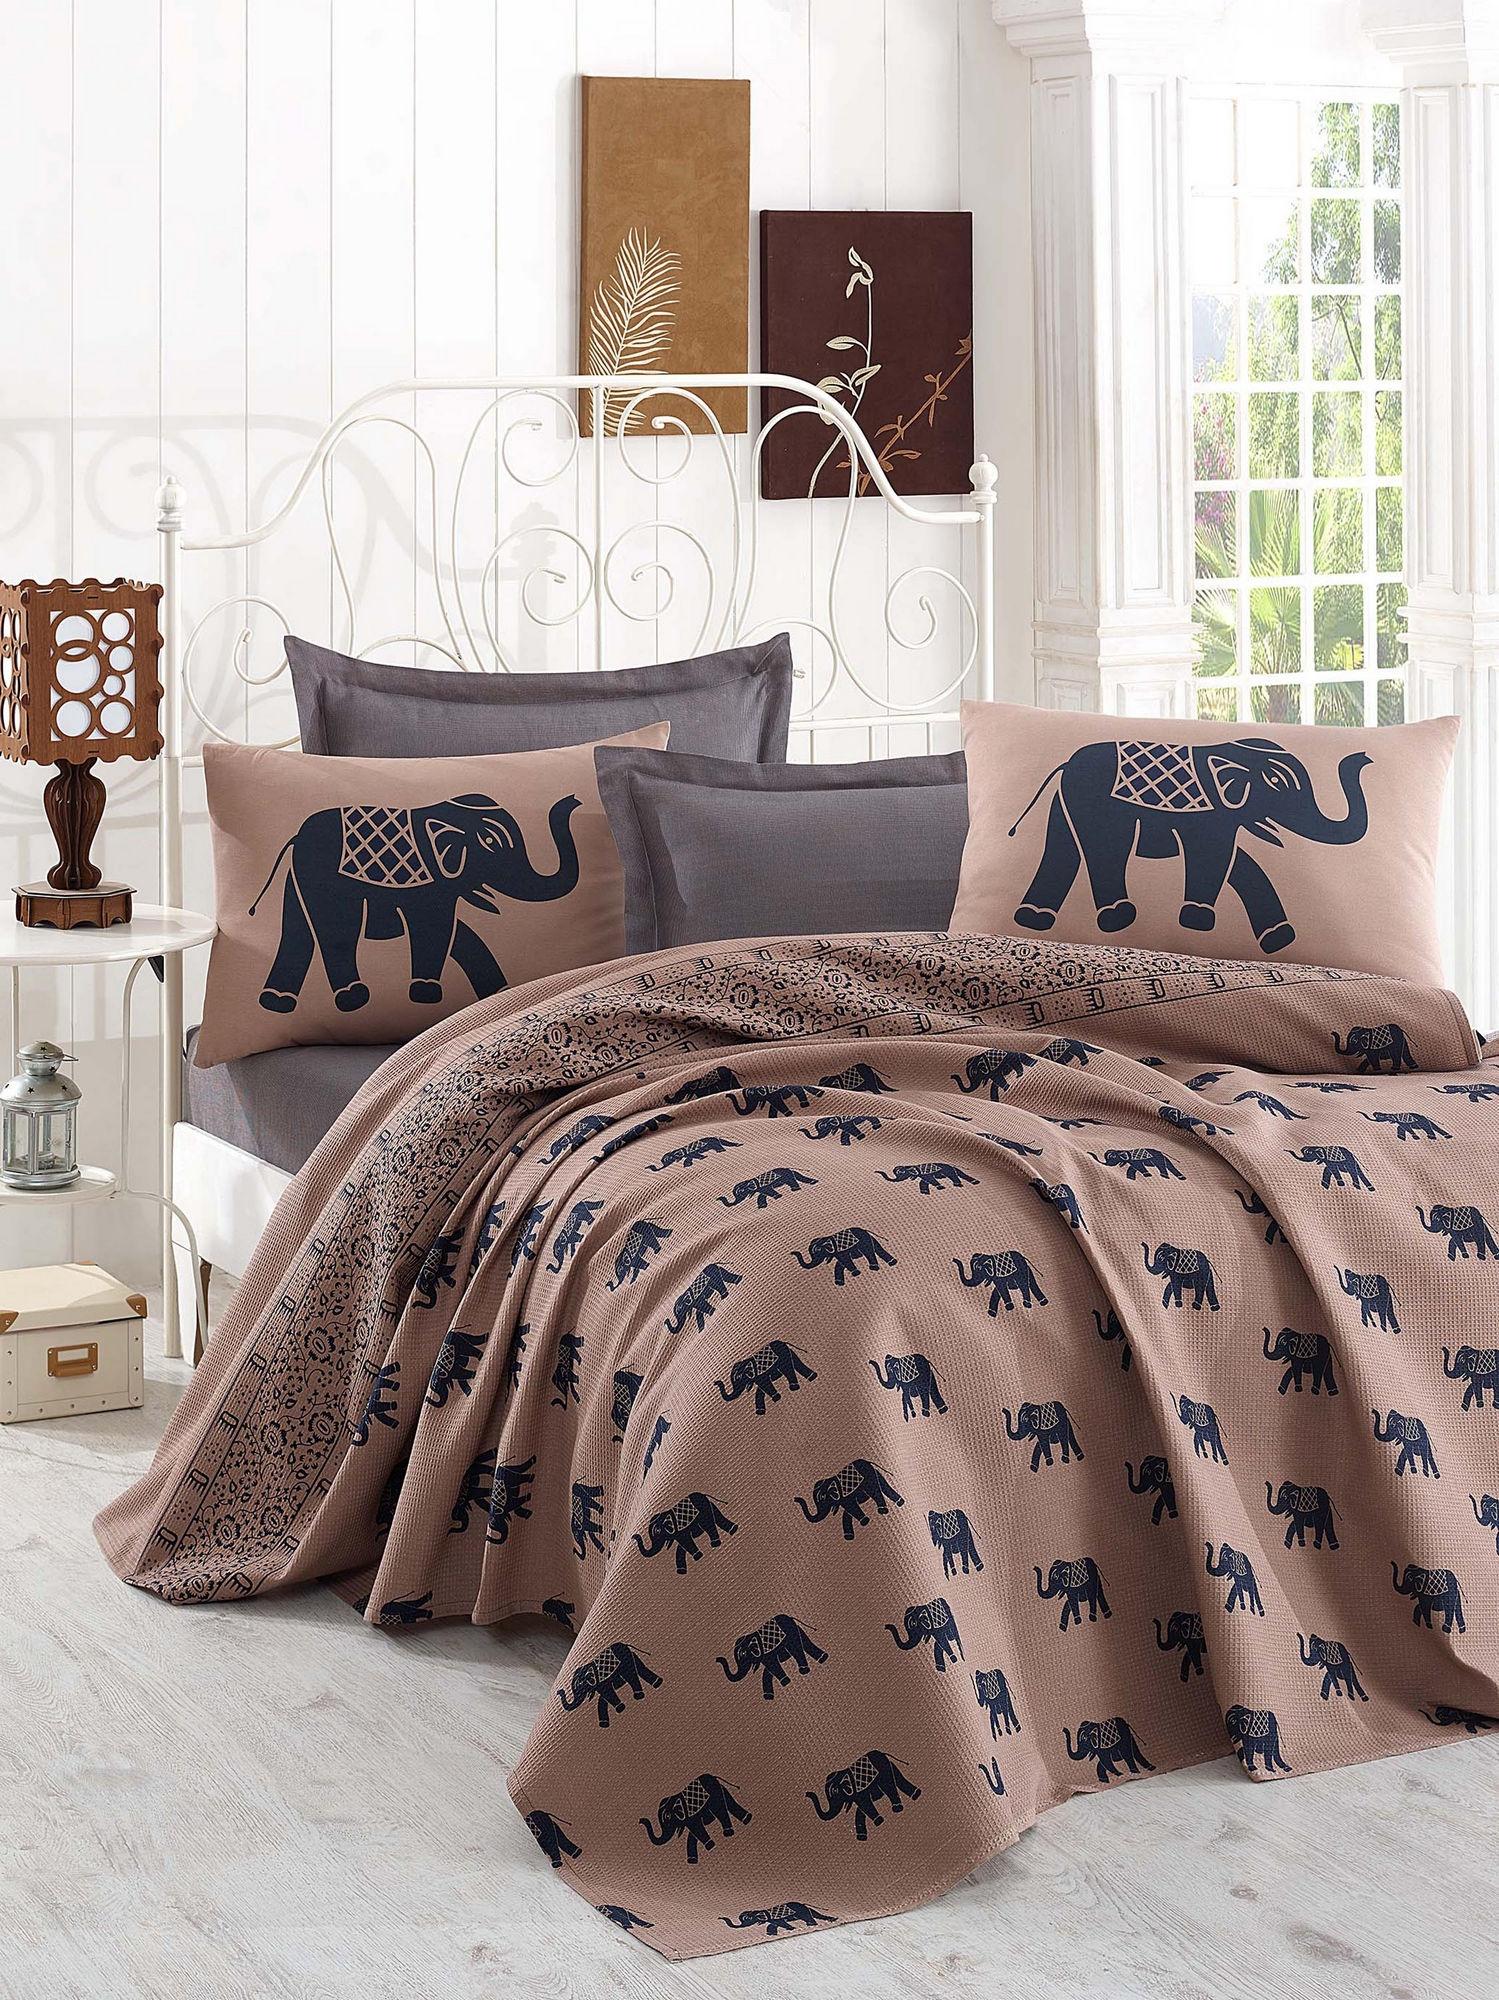 Set cuvertura de pat din bumbac, Fil Maro / Bleumarin, 4 piese, 200 x 235 cm somproduct.ro imagine 2021